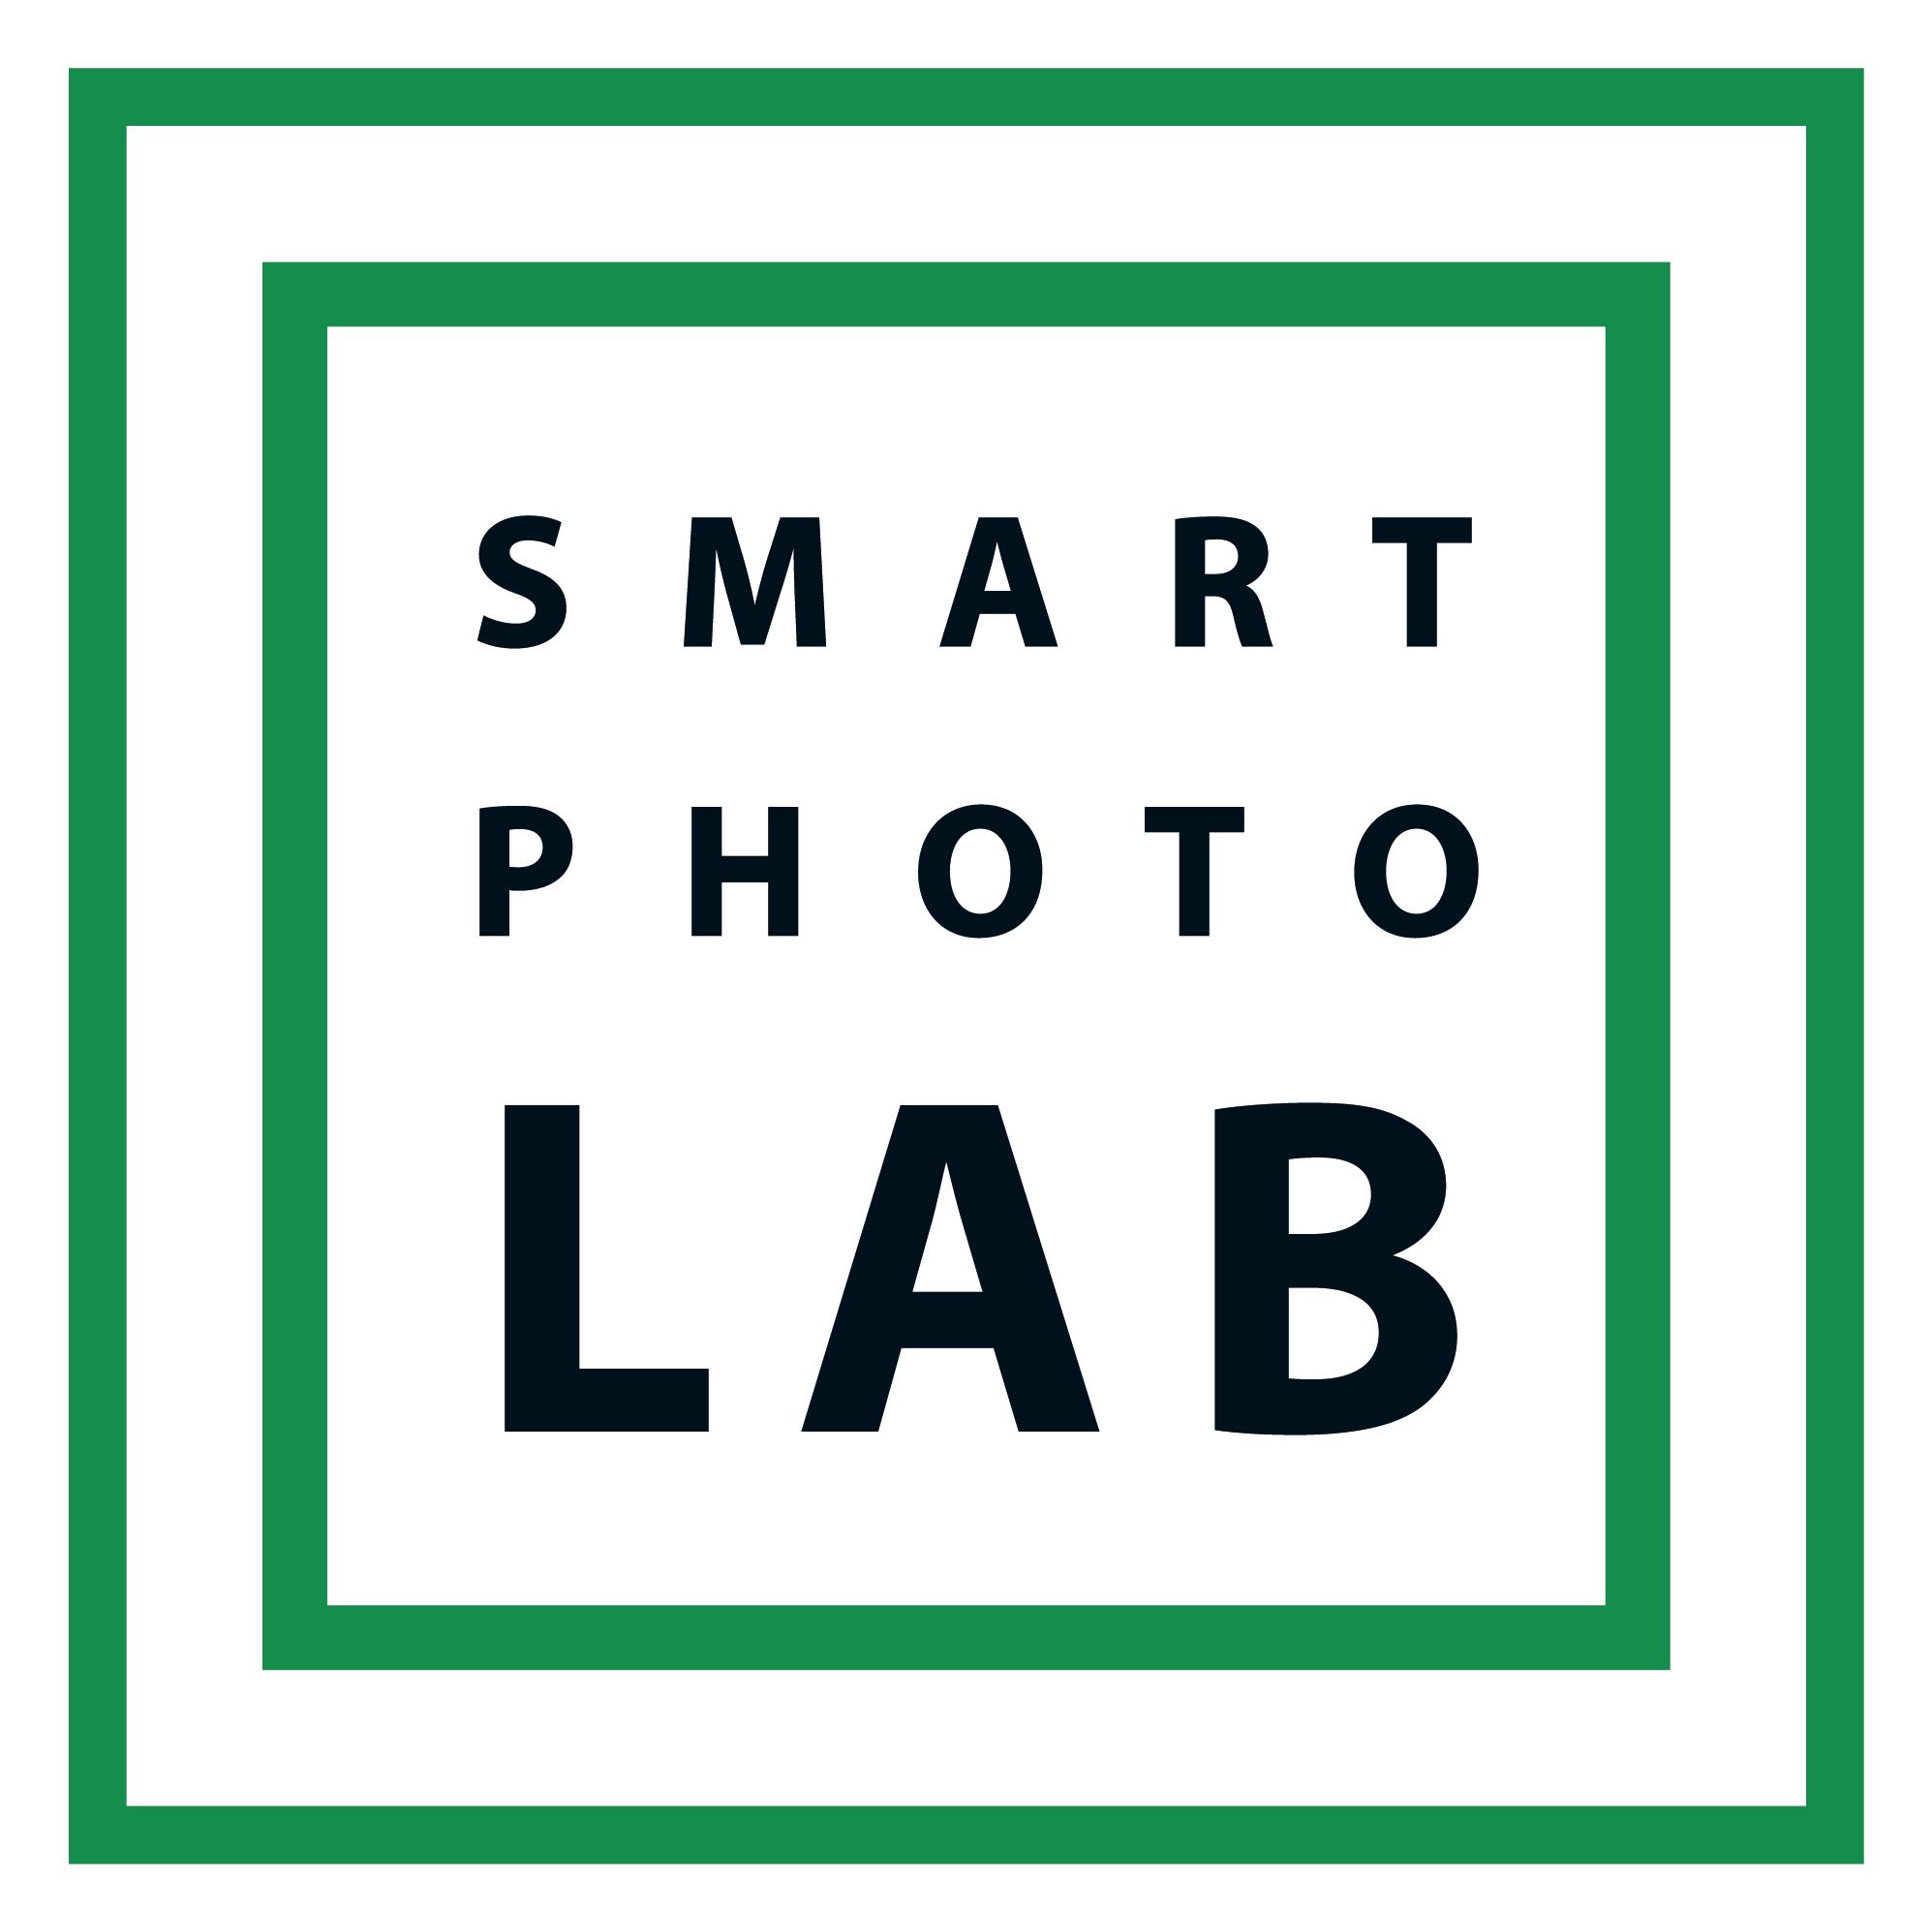 Smartphotolab